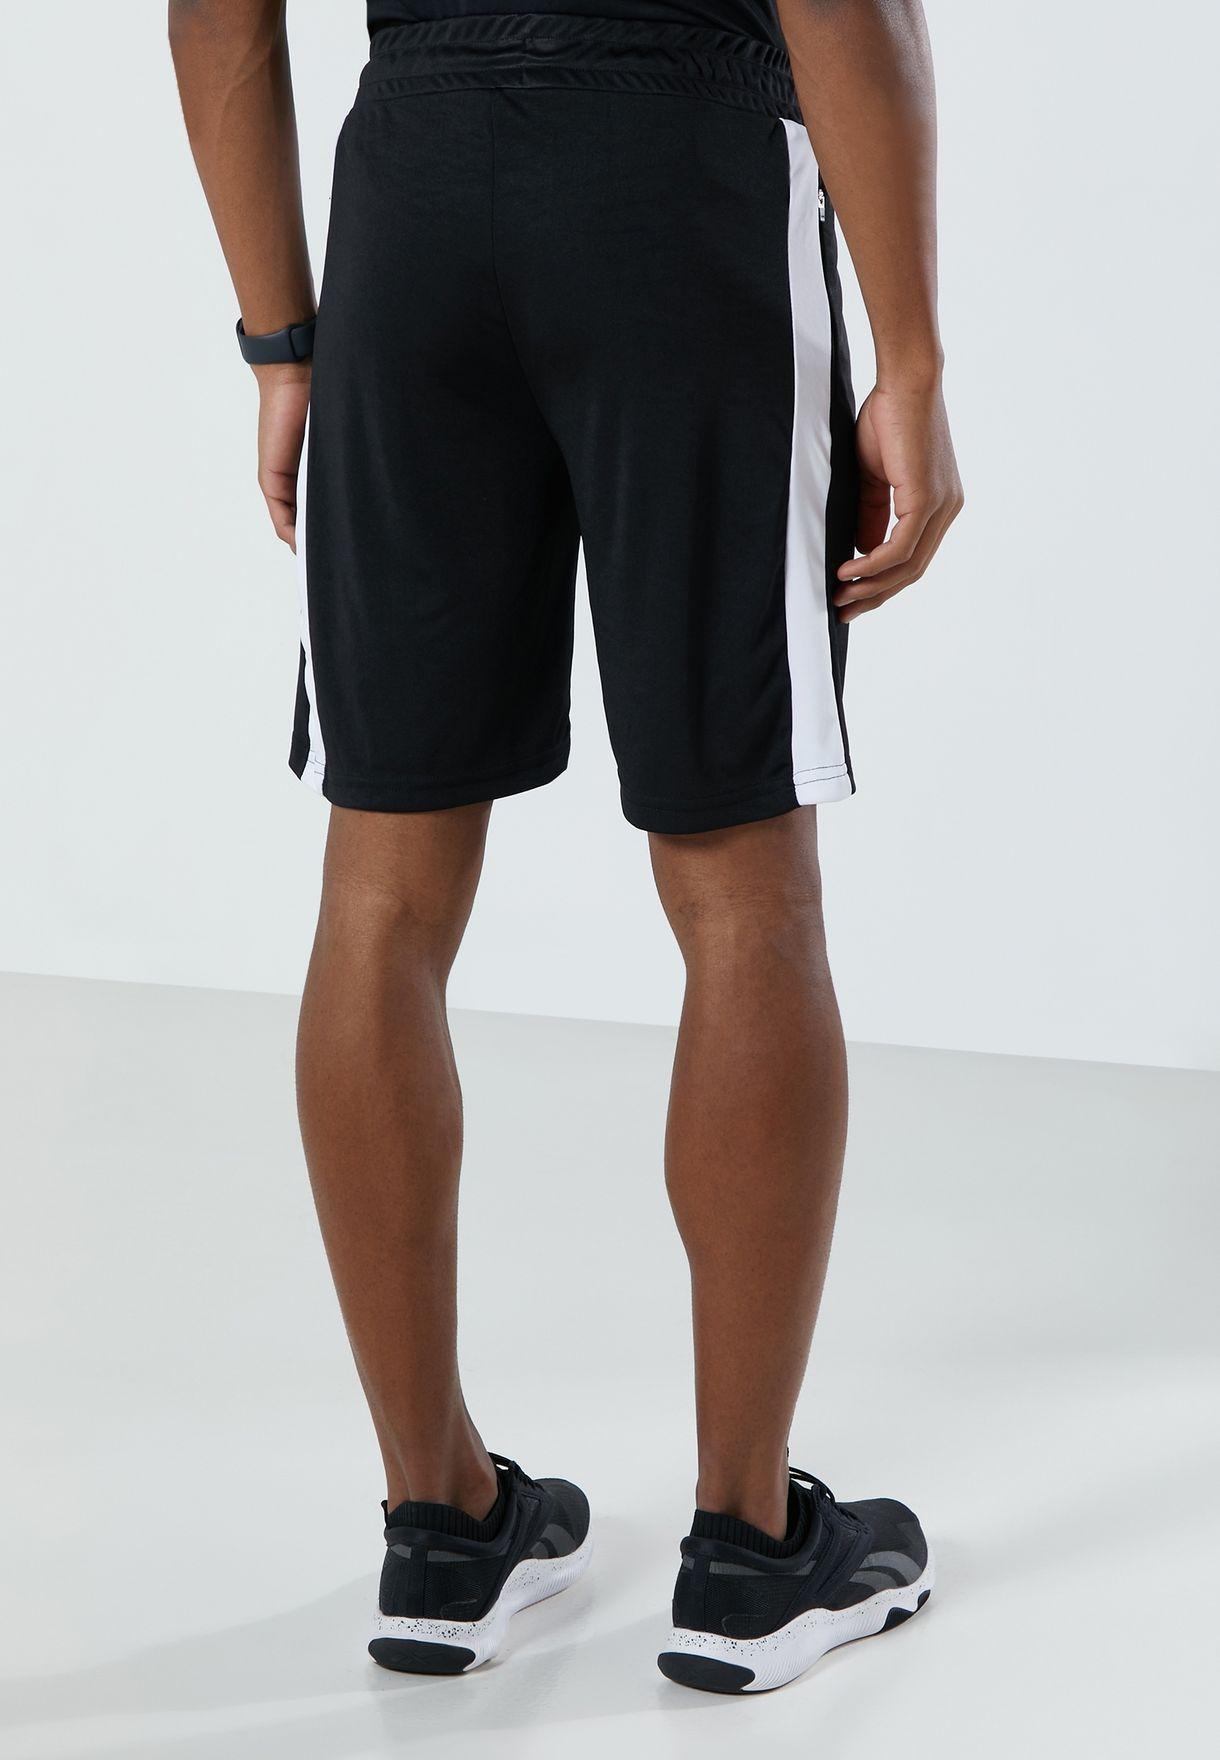 Contrast Panel Sport Shorts